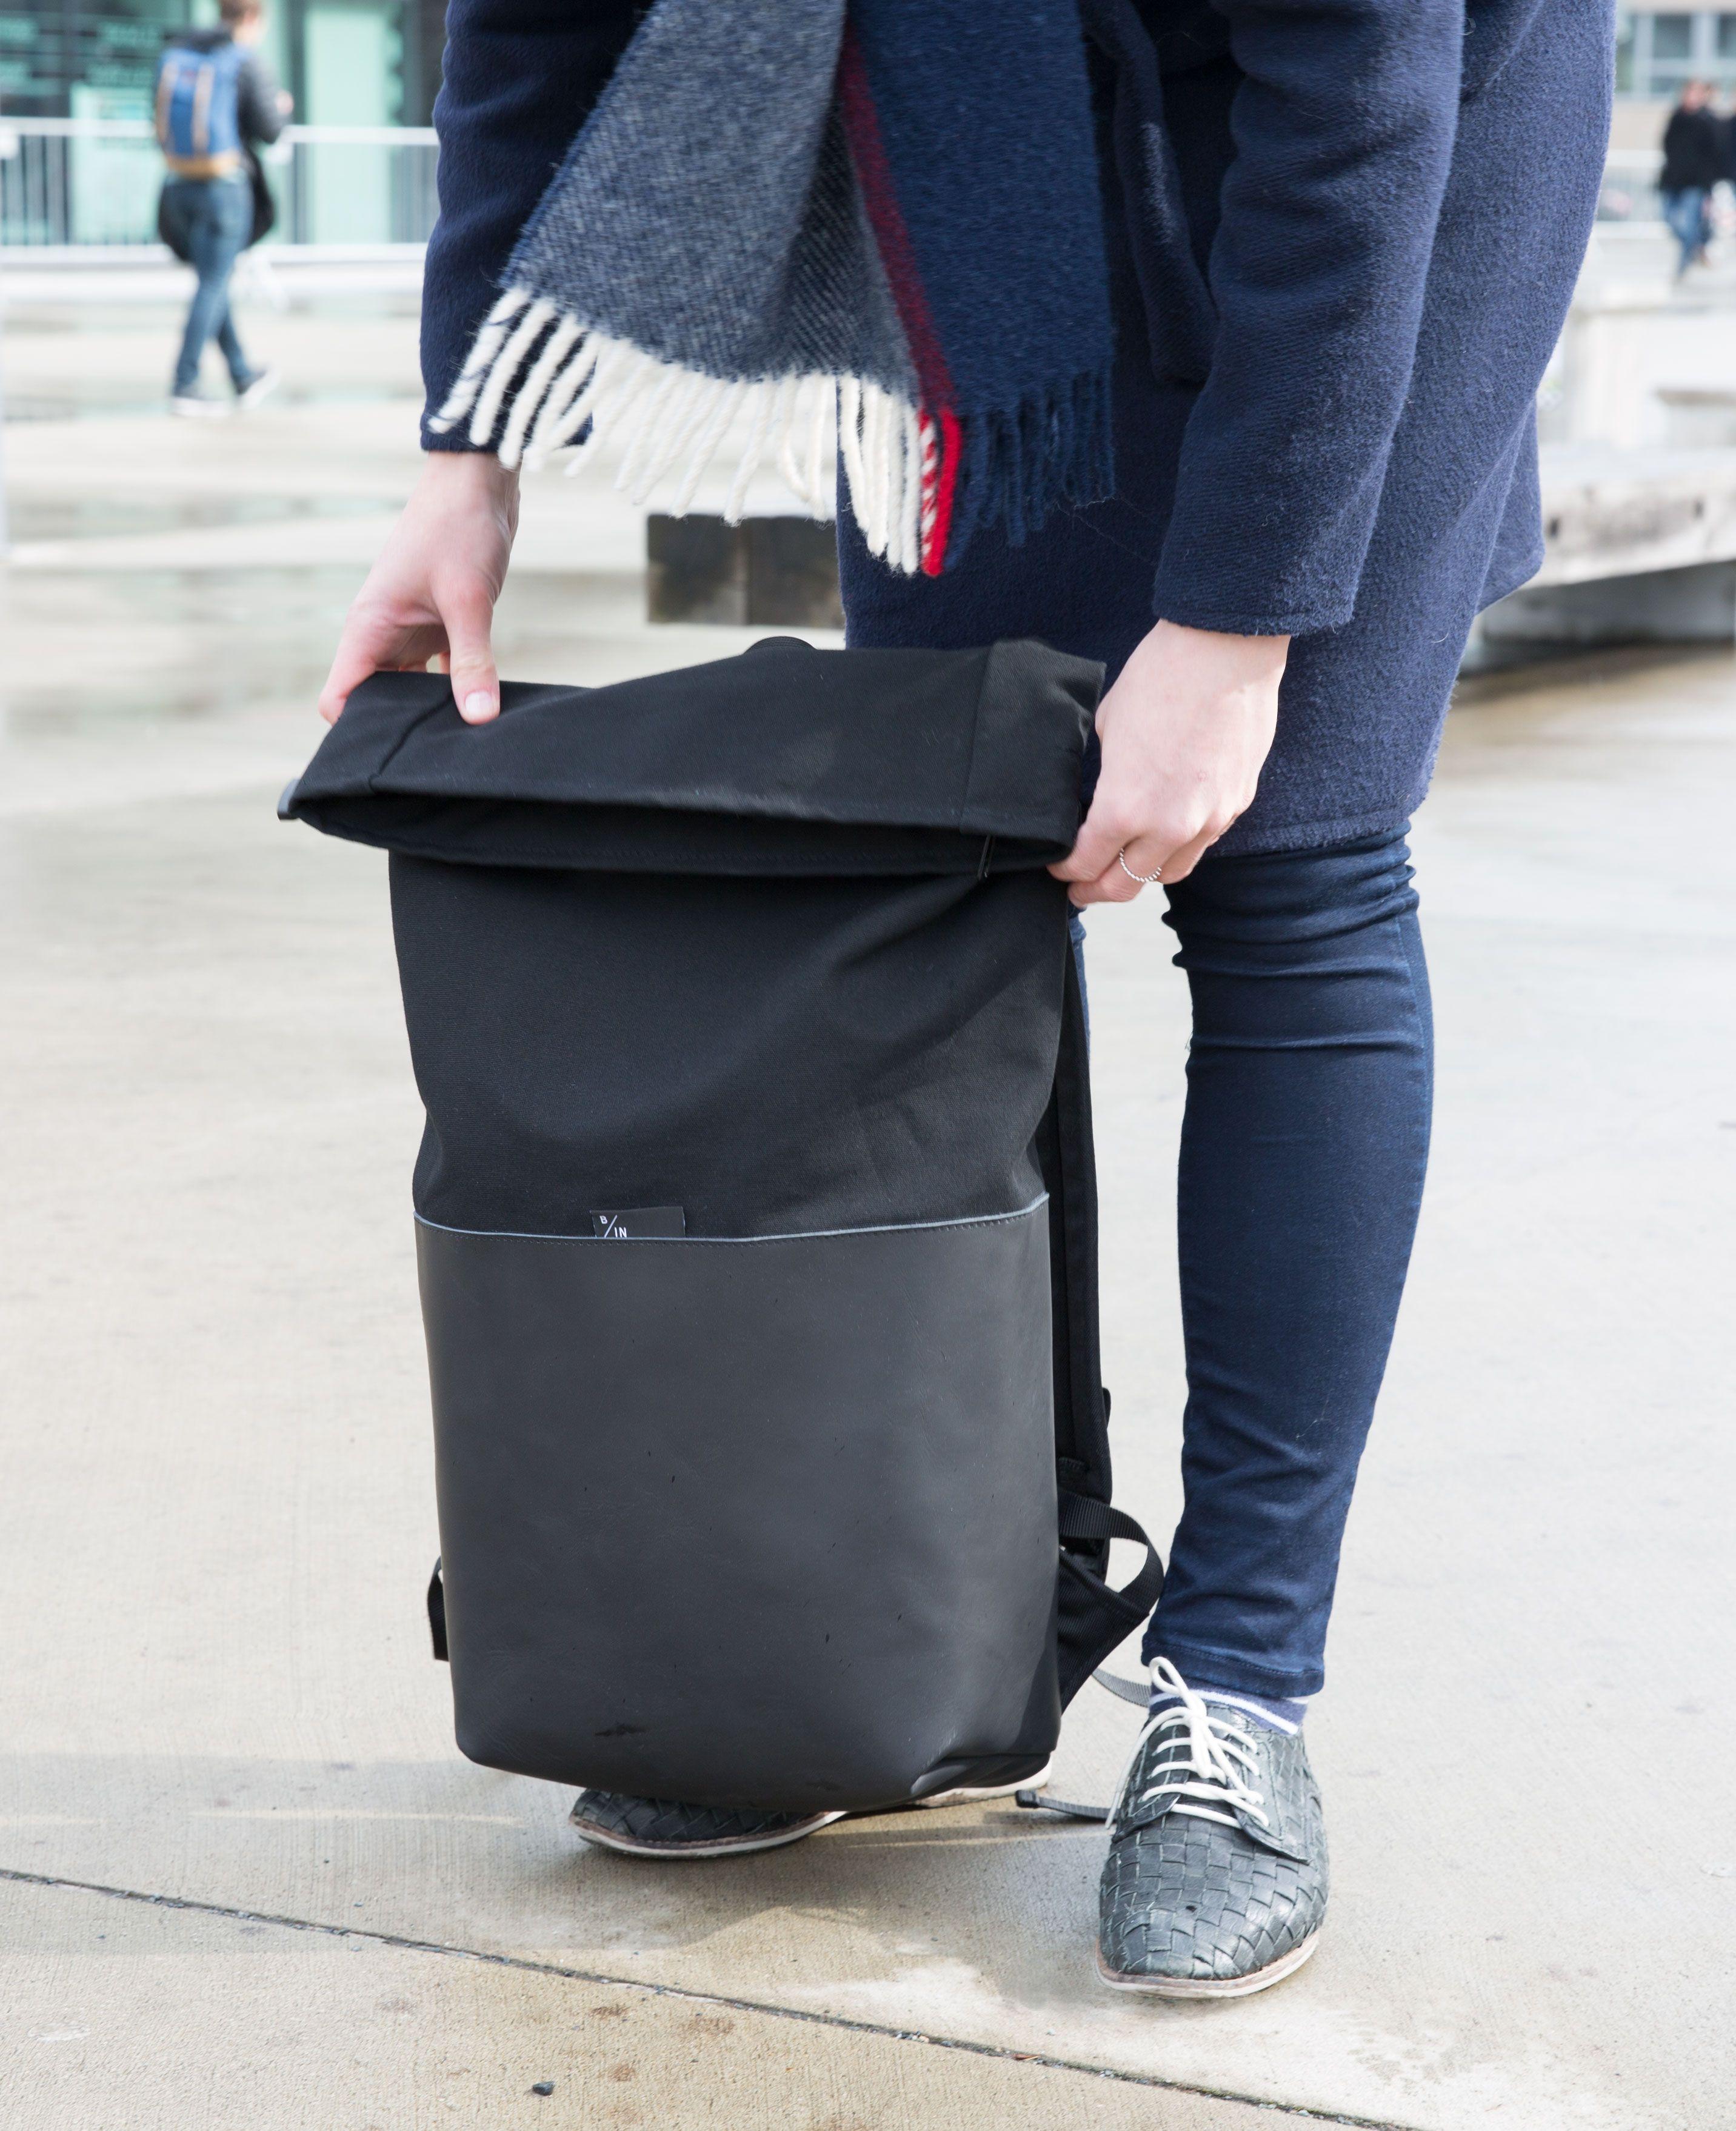 4eea42cf1 Braasi AYO Urban essentials Leather Backpack, Messenger Bag, Black Leather,  Satchel, Urban